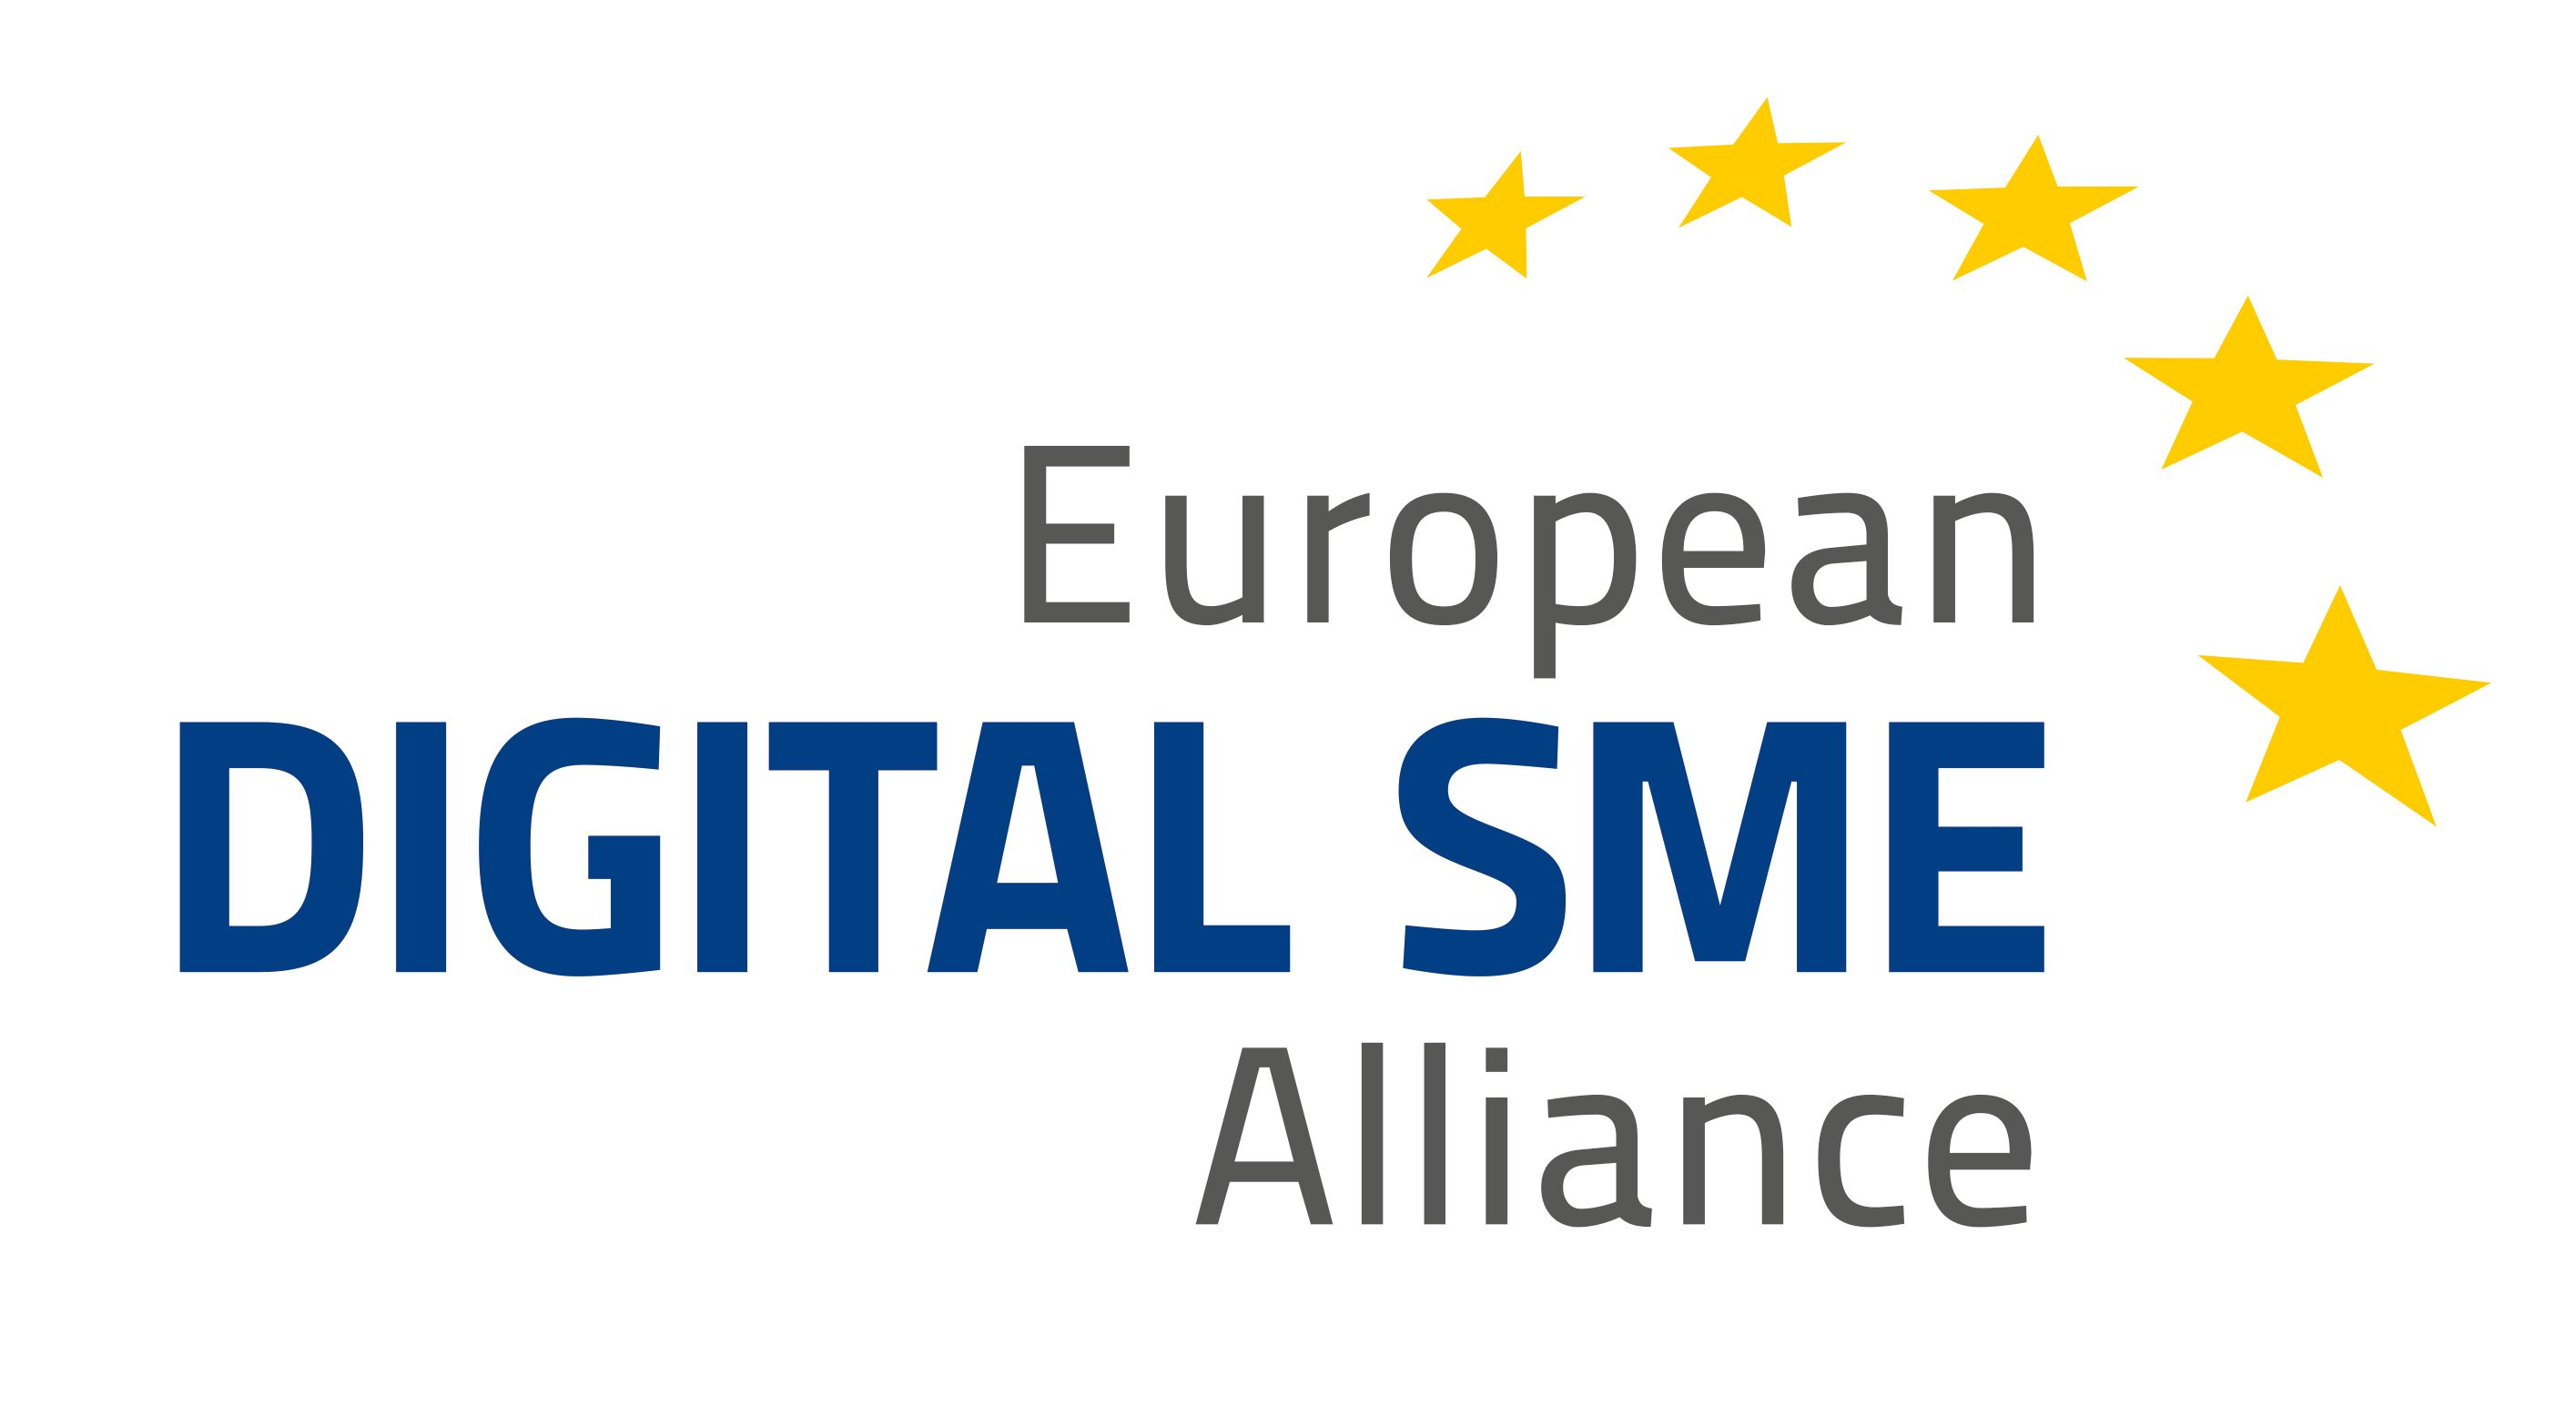 Digital SME